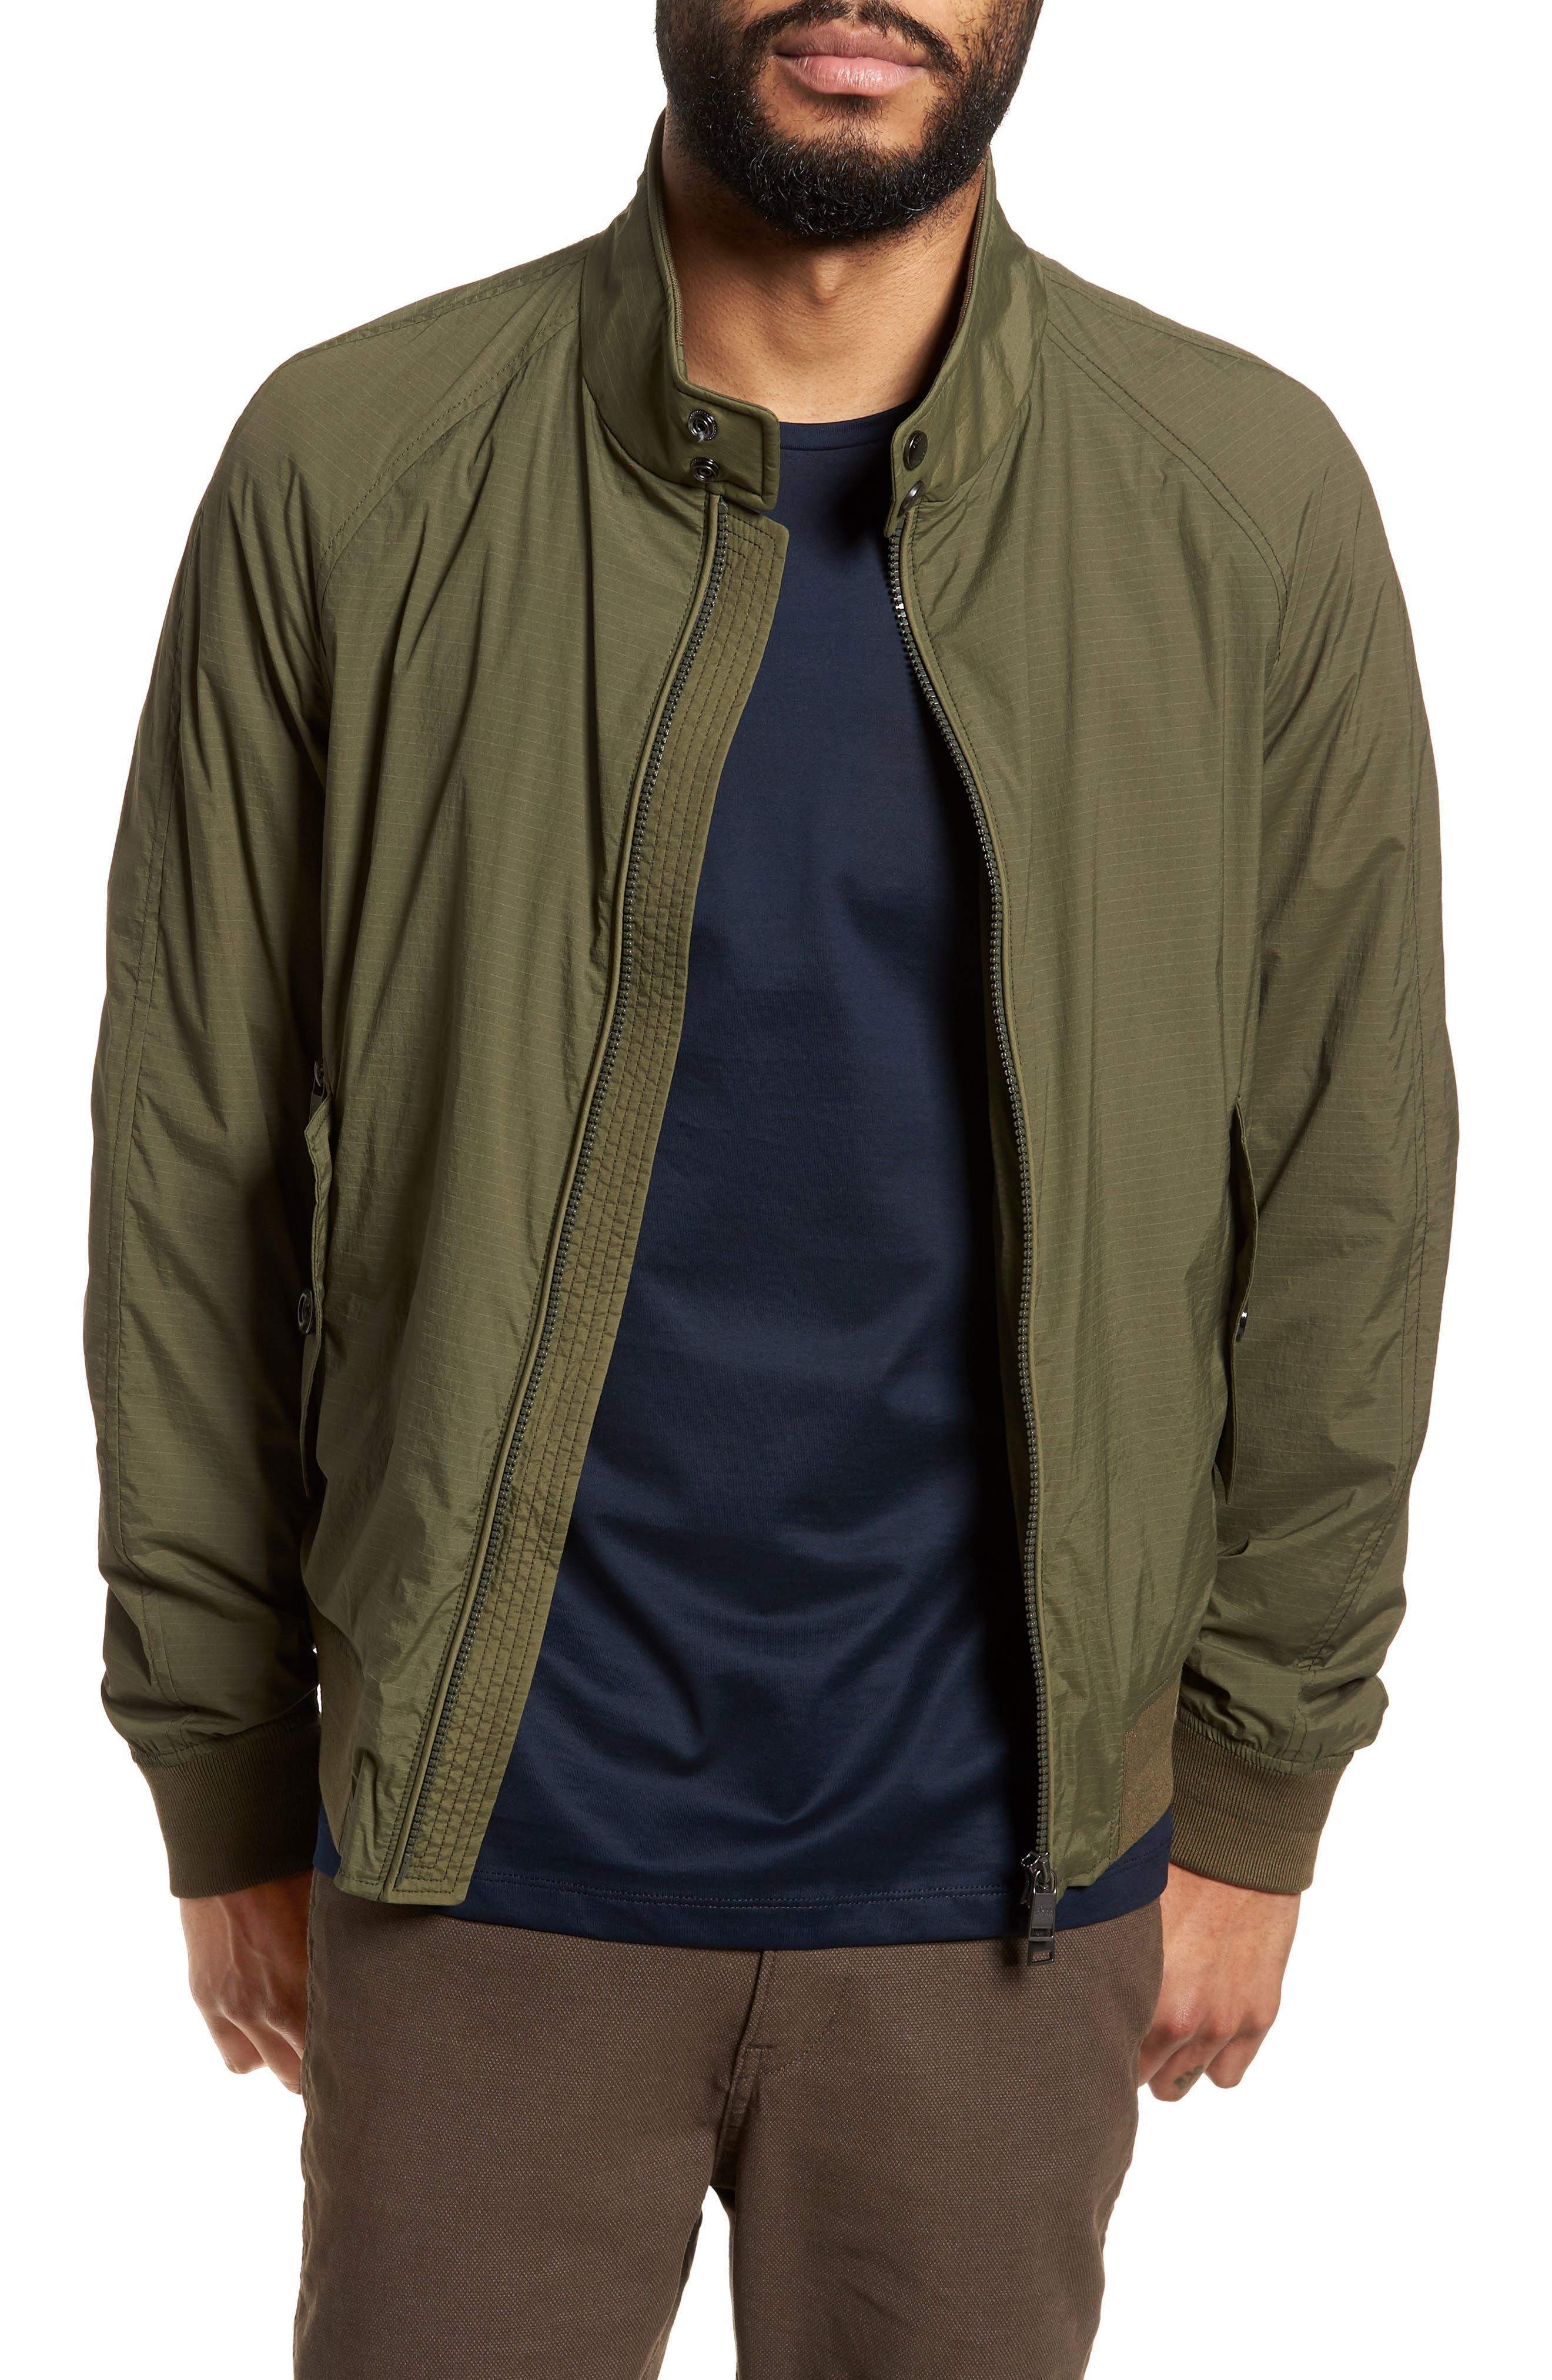 Camdan Ripstop Jacket,                             Main thumbnail 1, color,                             359